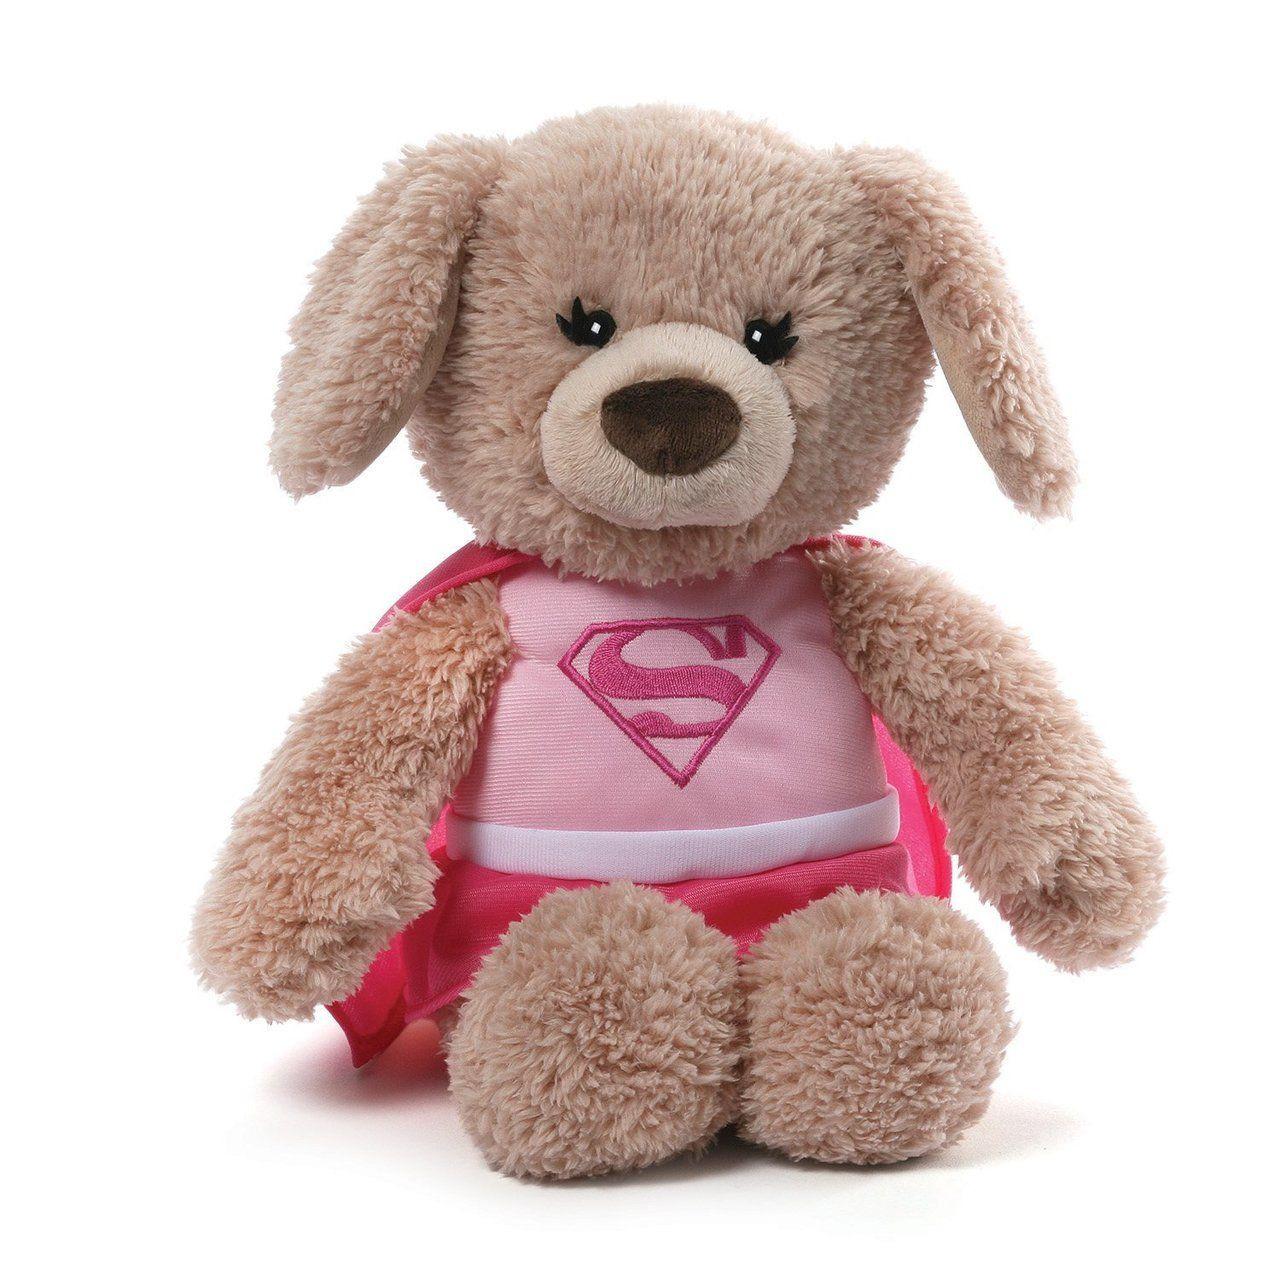 Gund Dc Comics Supergirl Yvette Stuffed Animal Plush Dog Pink 12